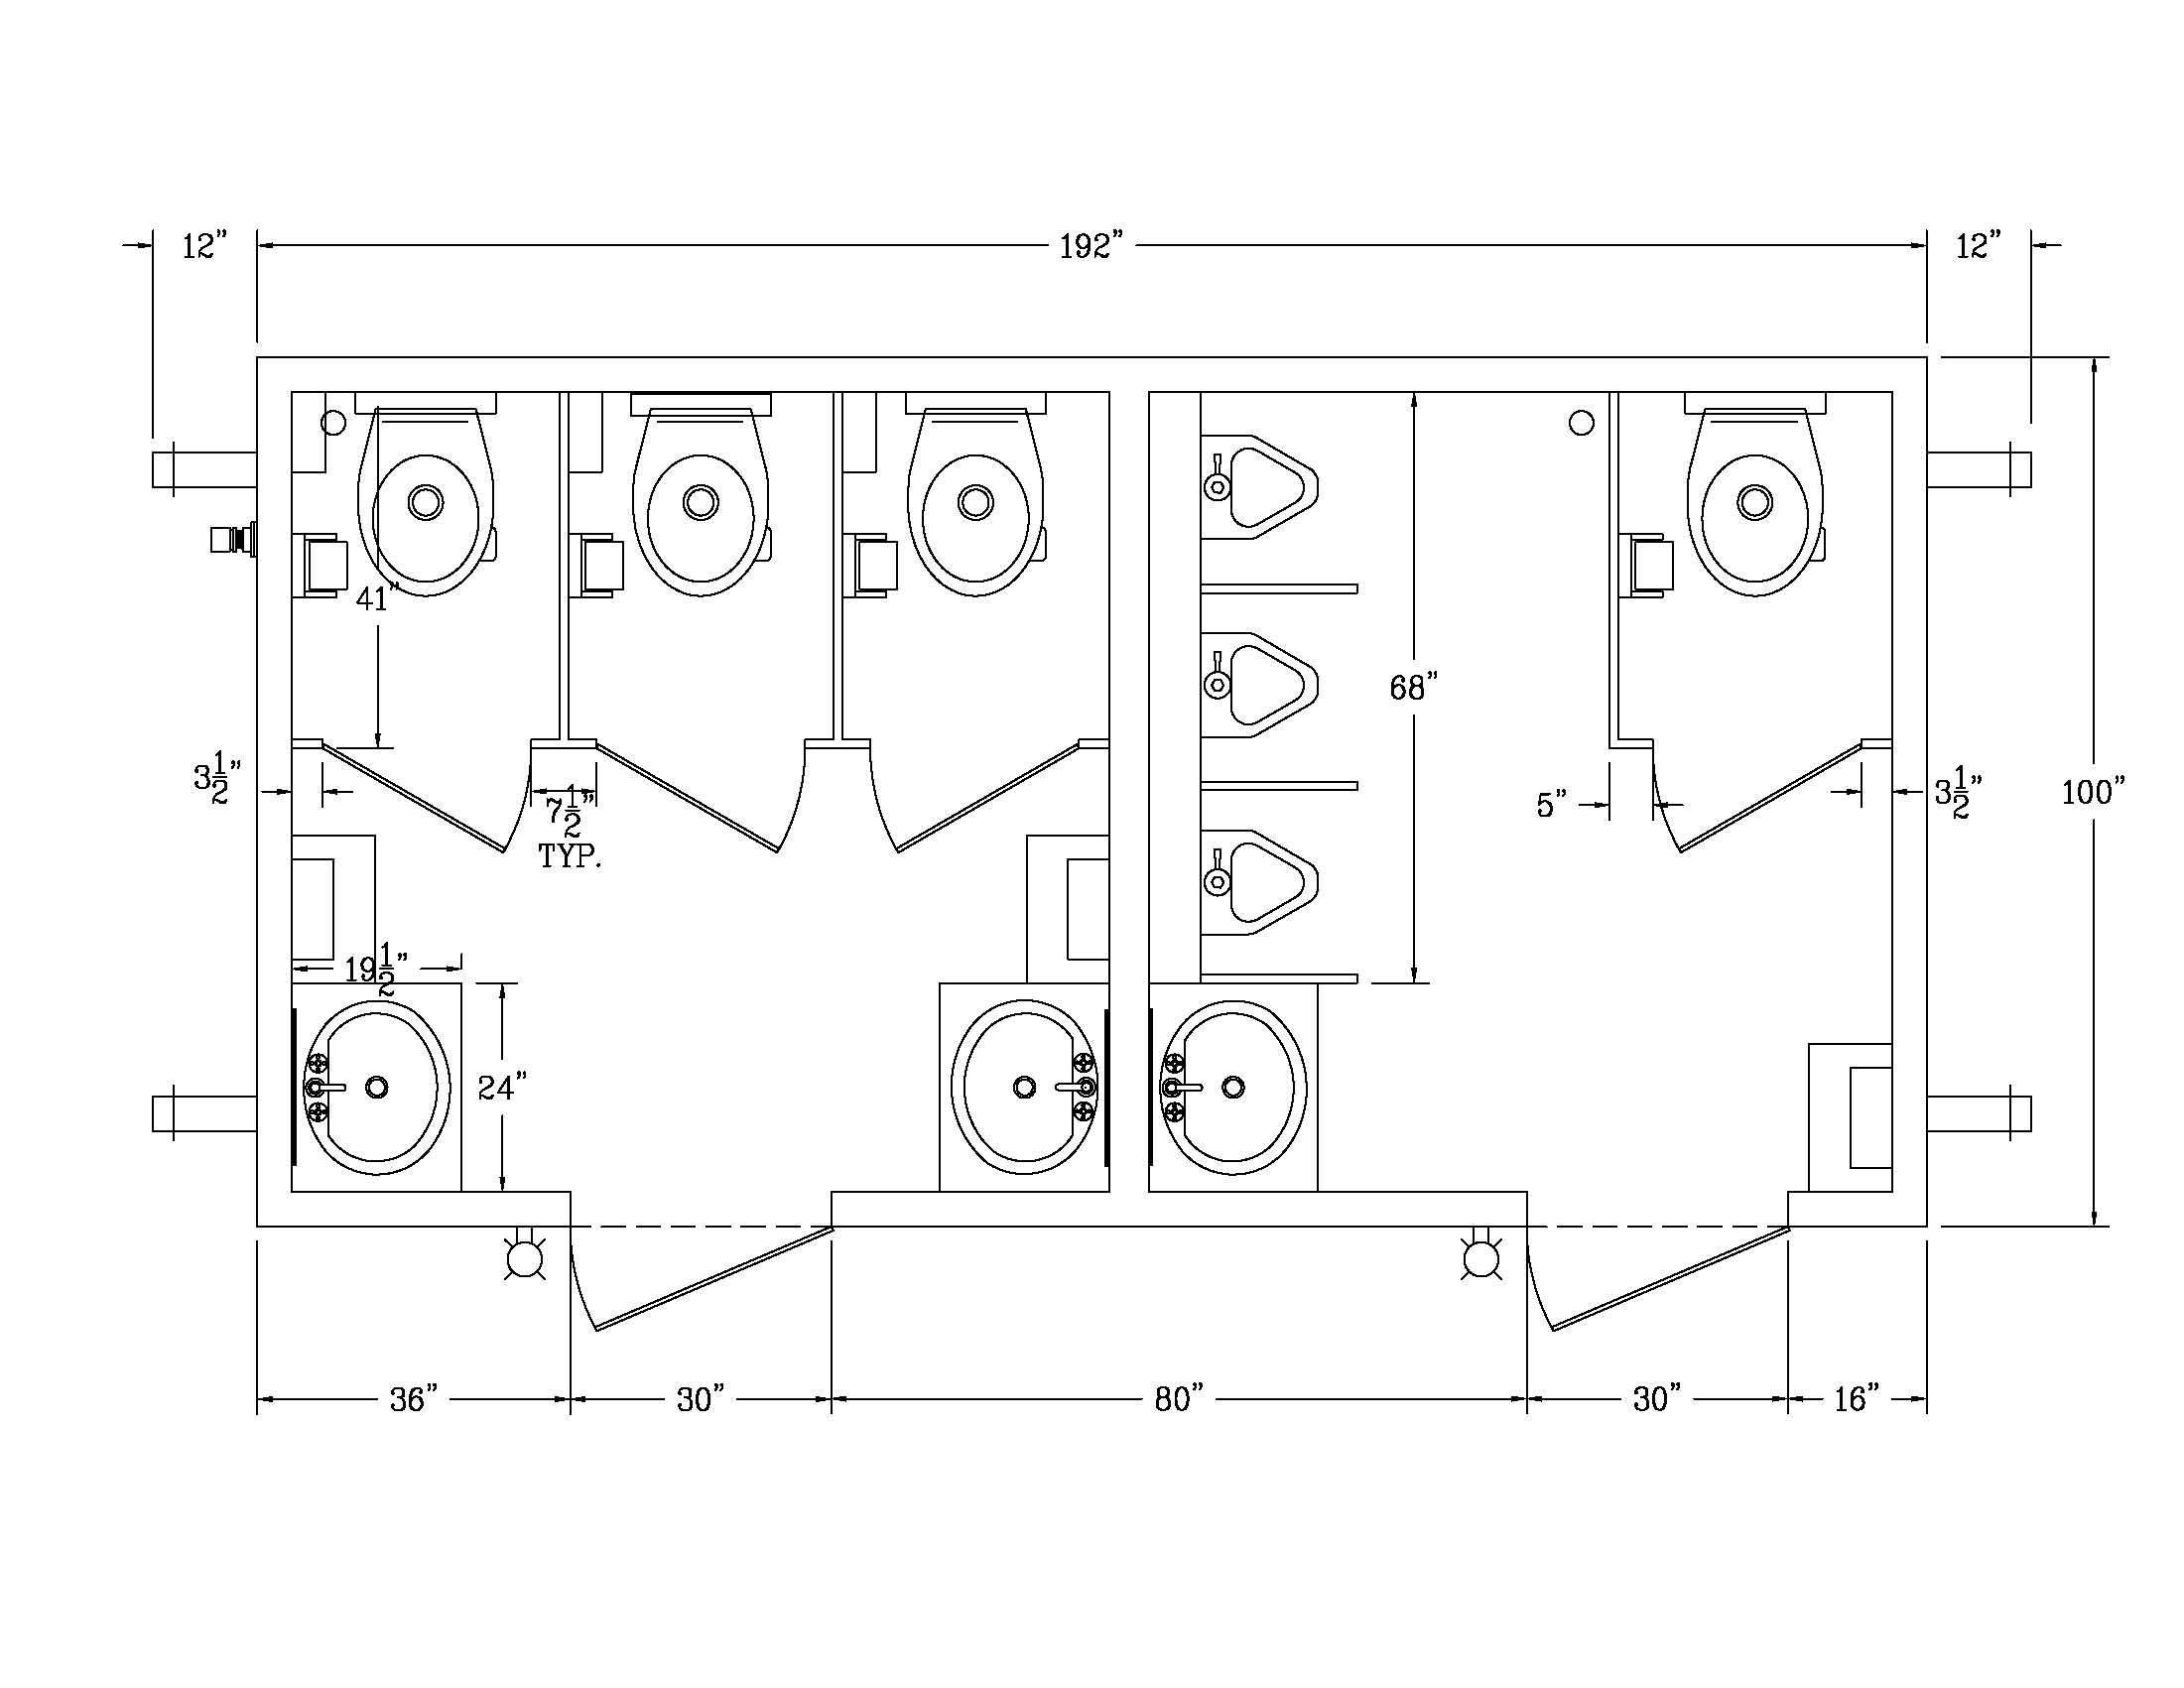 small resolution of charming bathroom stall dimensions part 1 public bathroom stall dimensions